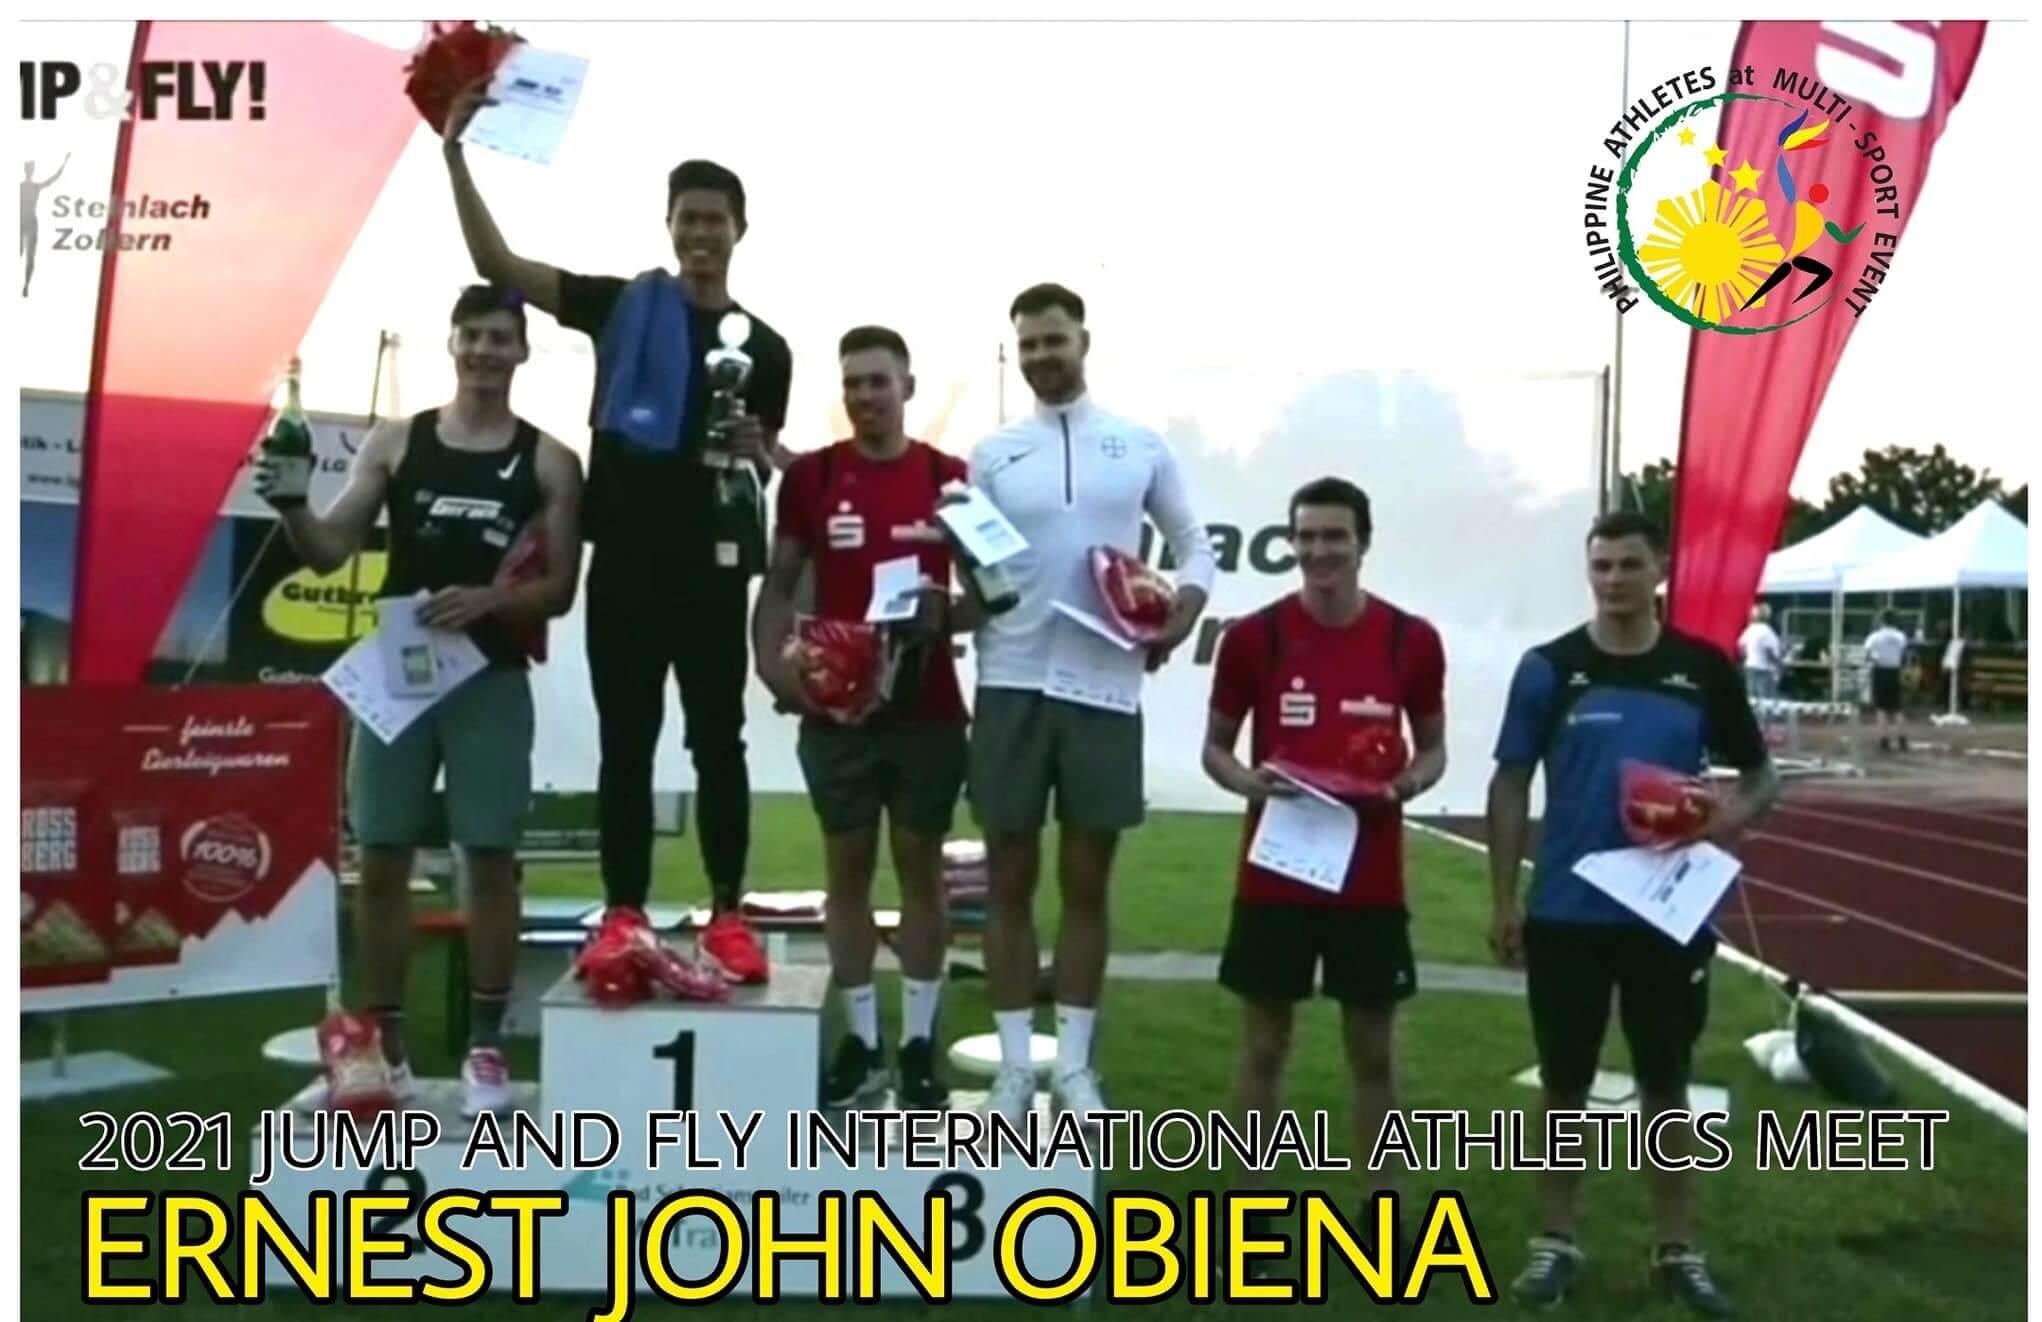 EJ Obiena - Ernest Obiena 5.93m Asian Record !!!! 6